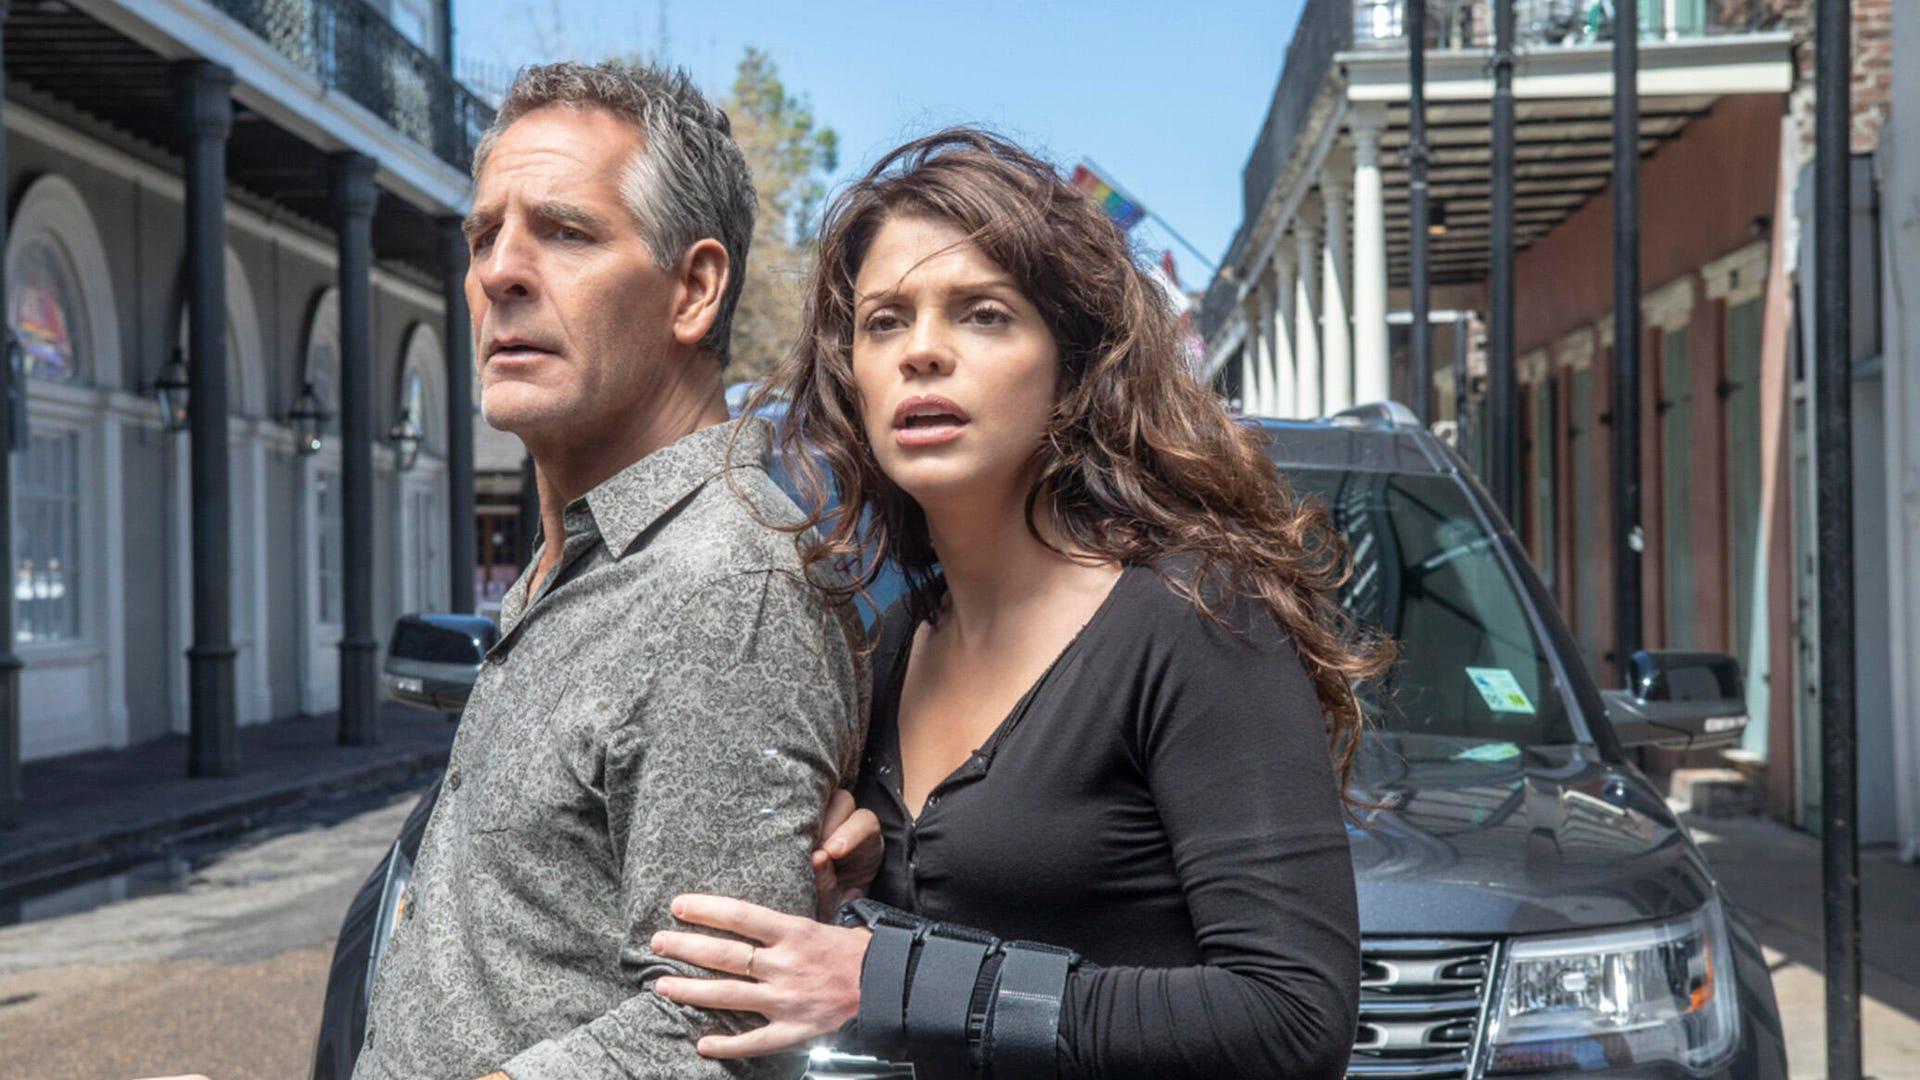 Scott Bakula and Vanessa Ferlito, NCIS: New Orleans